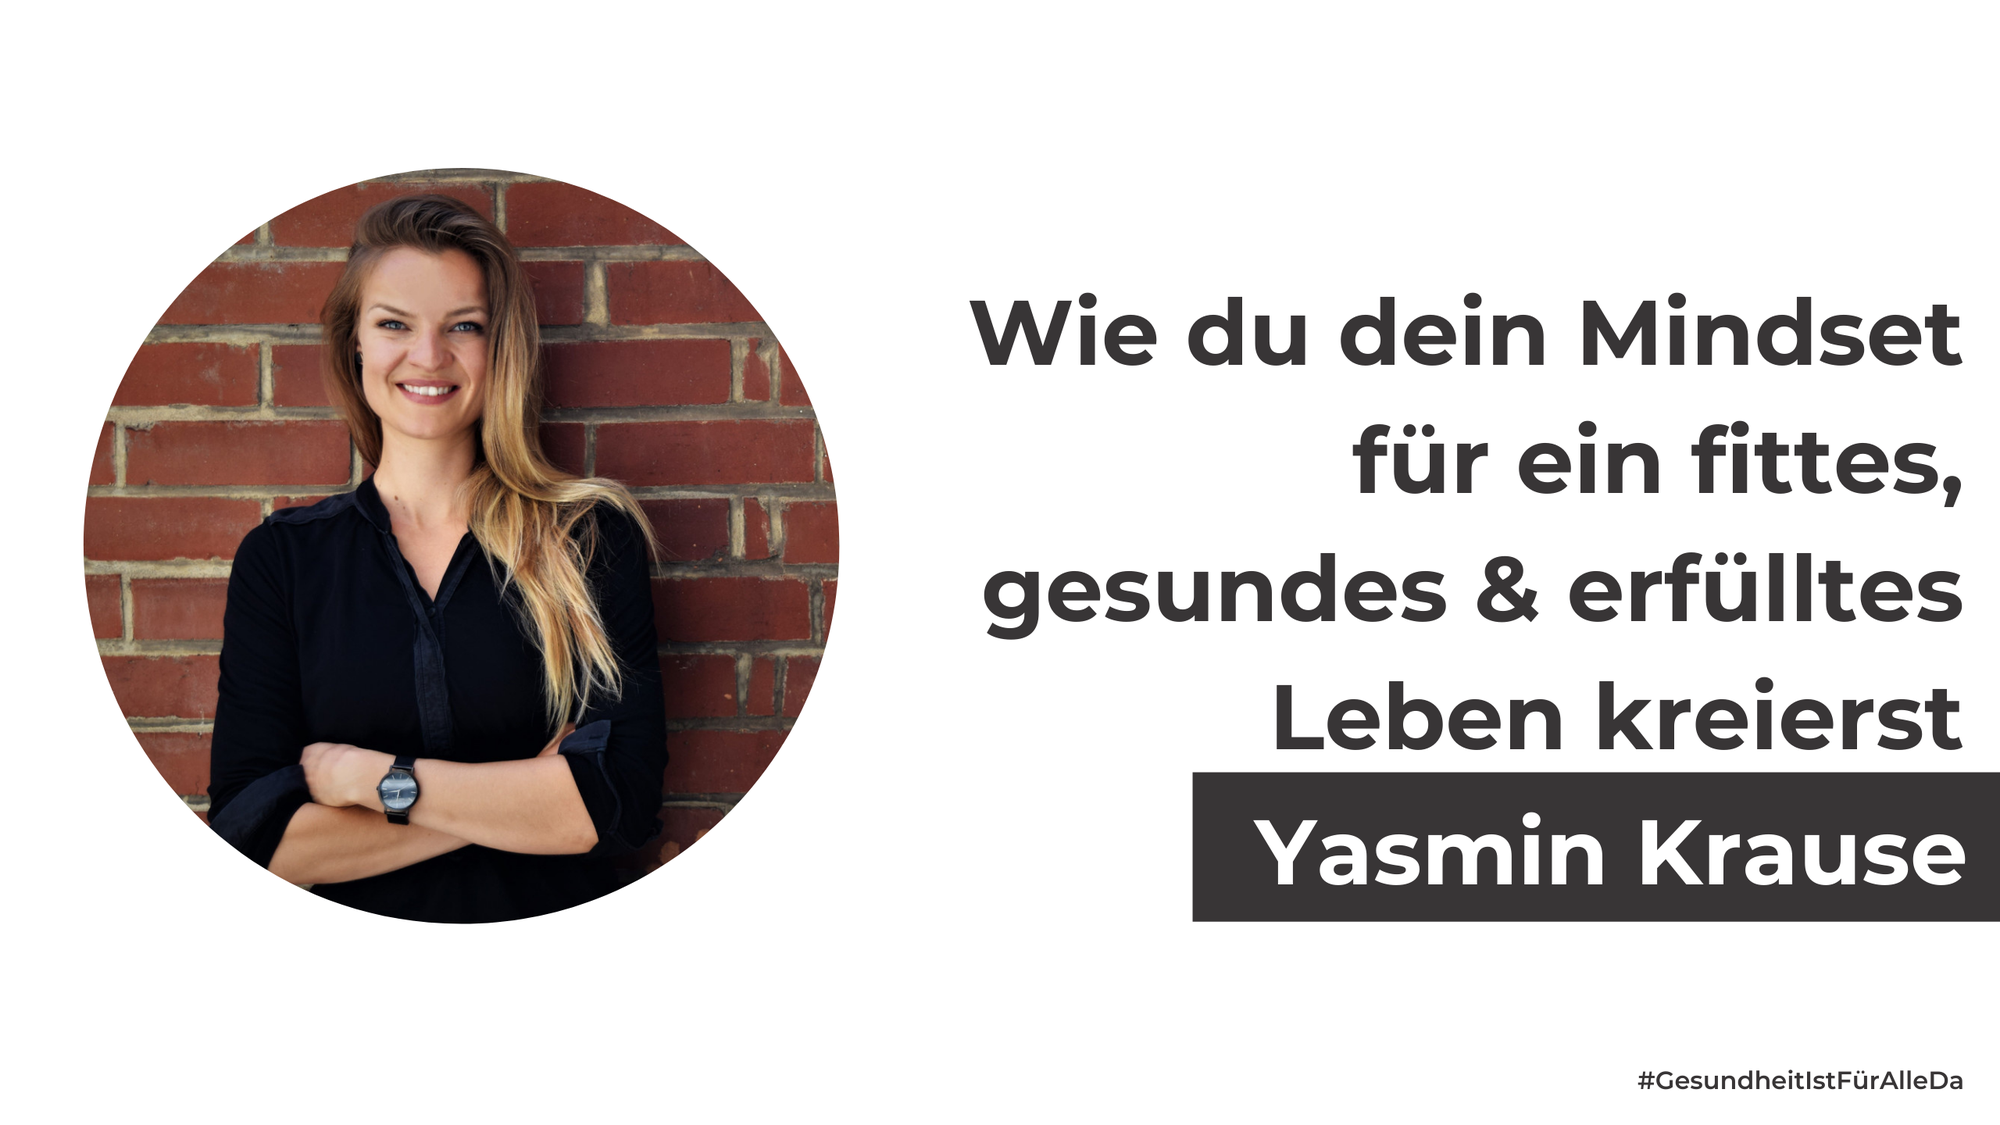 Yasmin Krause